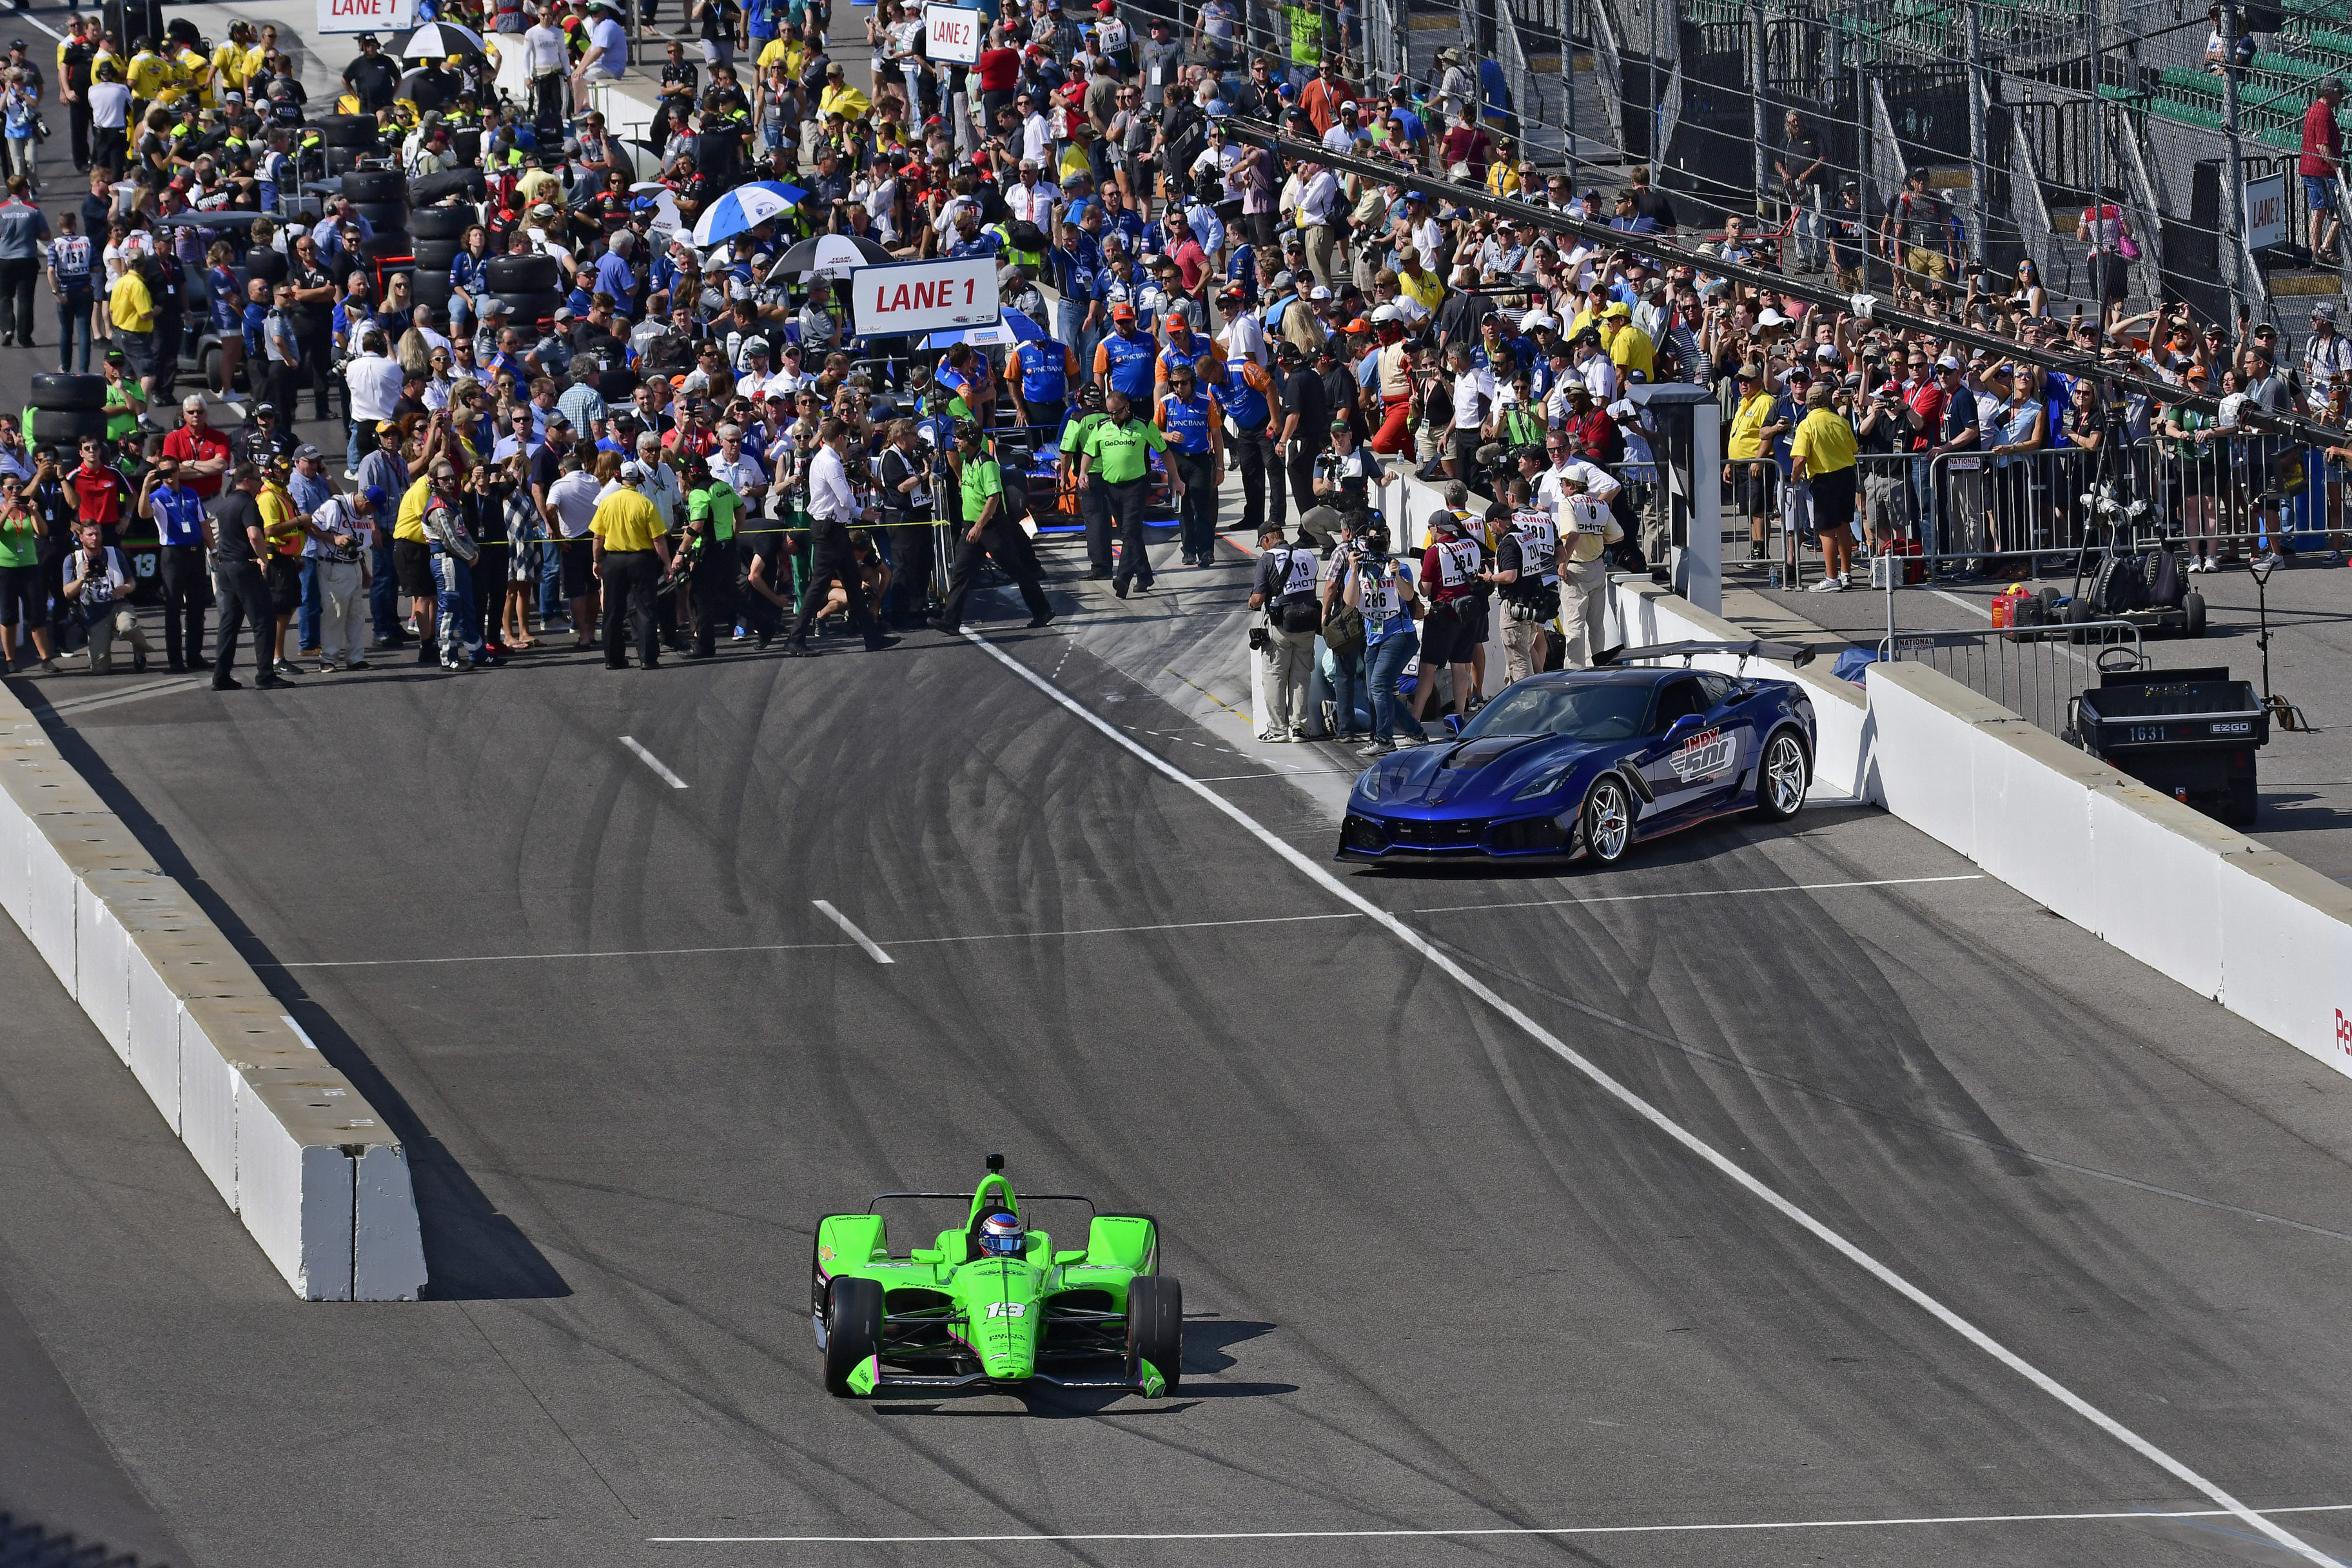 2018 Indy 500 Starting Lineup Racing News